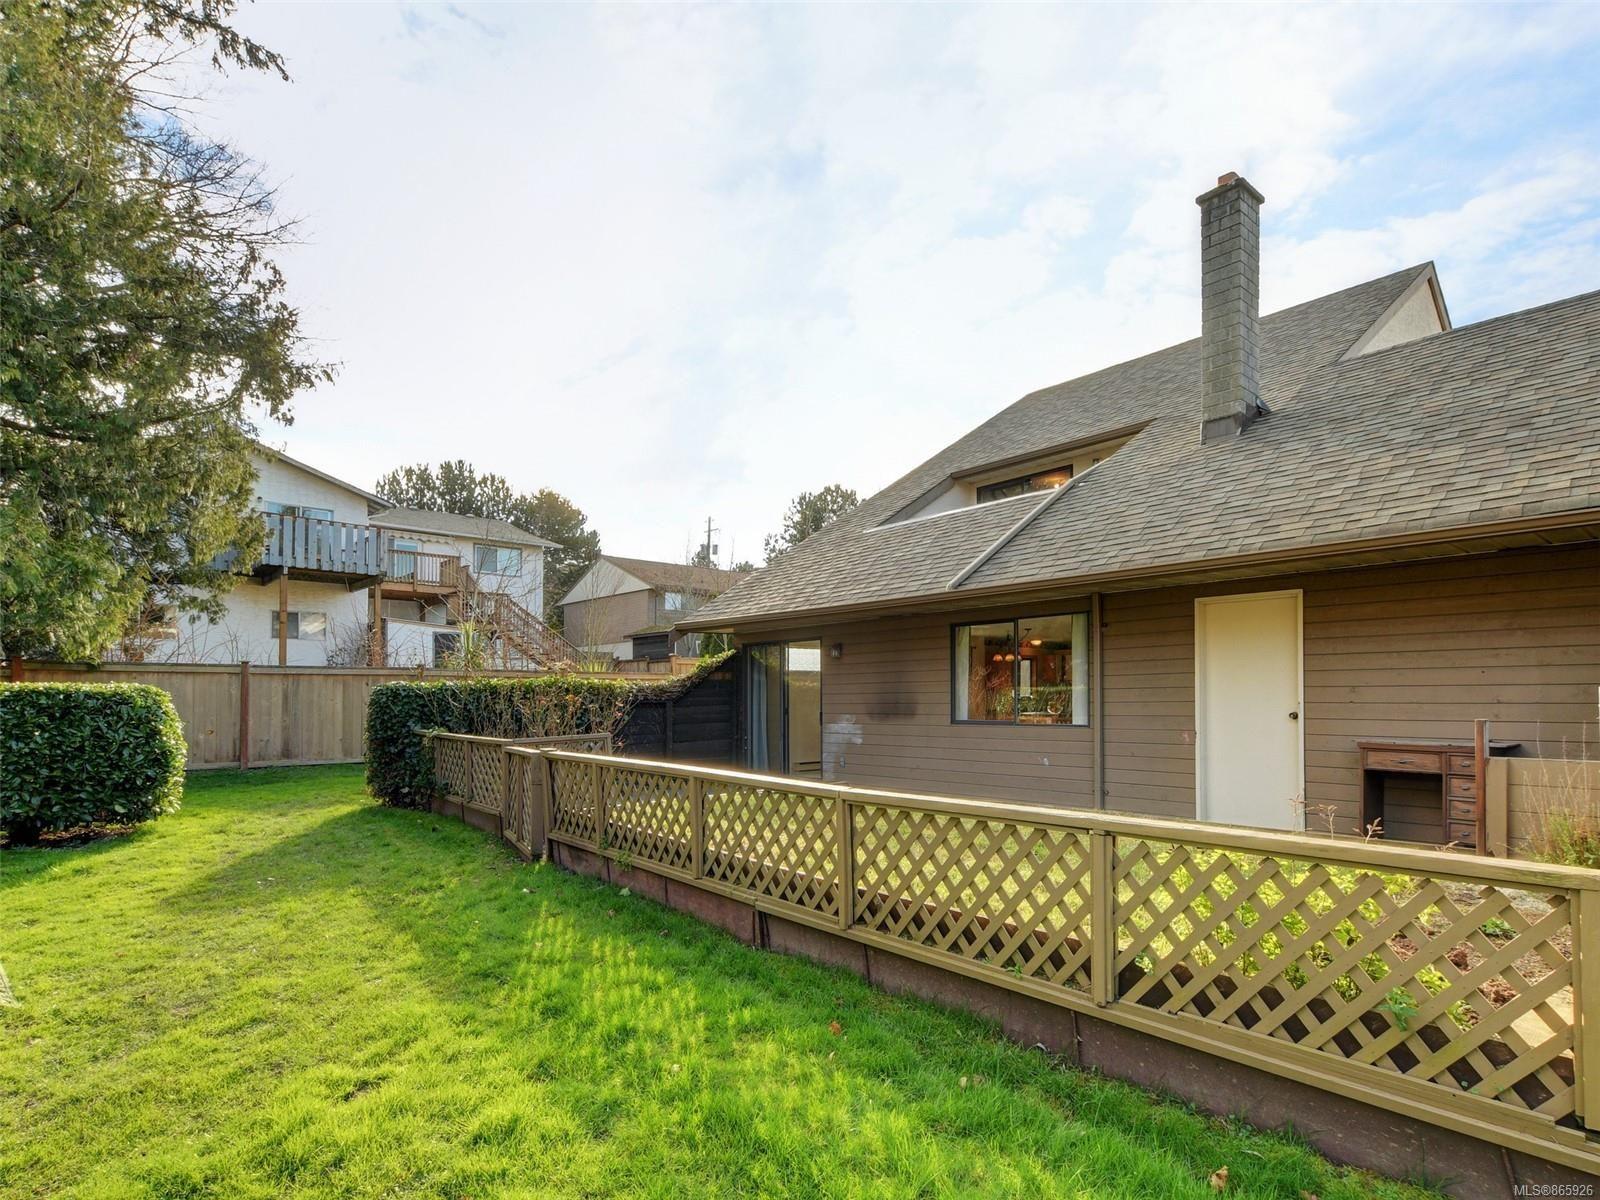 Photo 22: Photos: 8 4350 West Saanich Rd in : SW Royal Oak Row/Townhouse for sale (Saanich West)  : MLS®# 865926